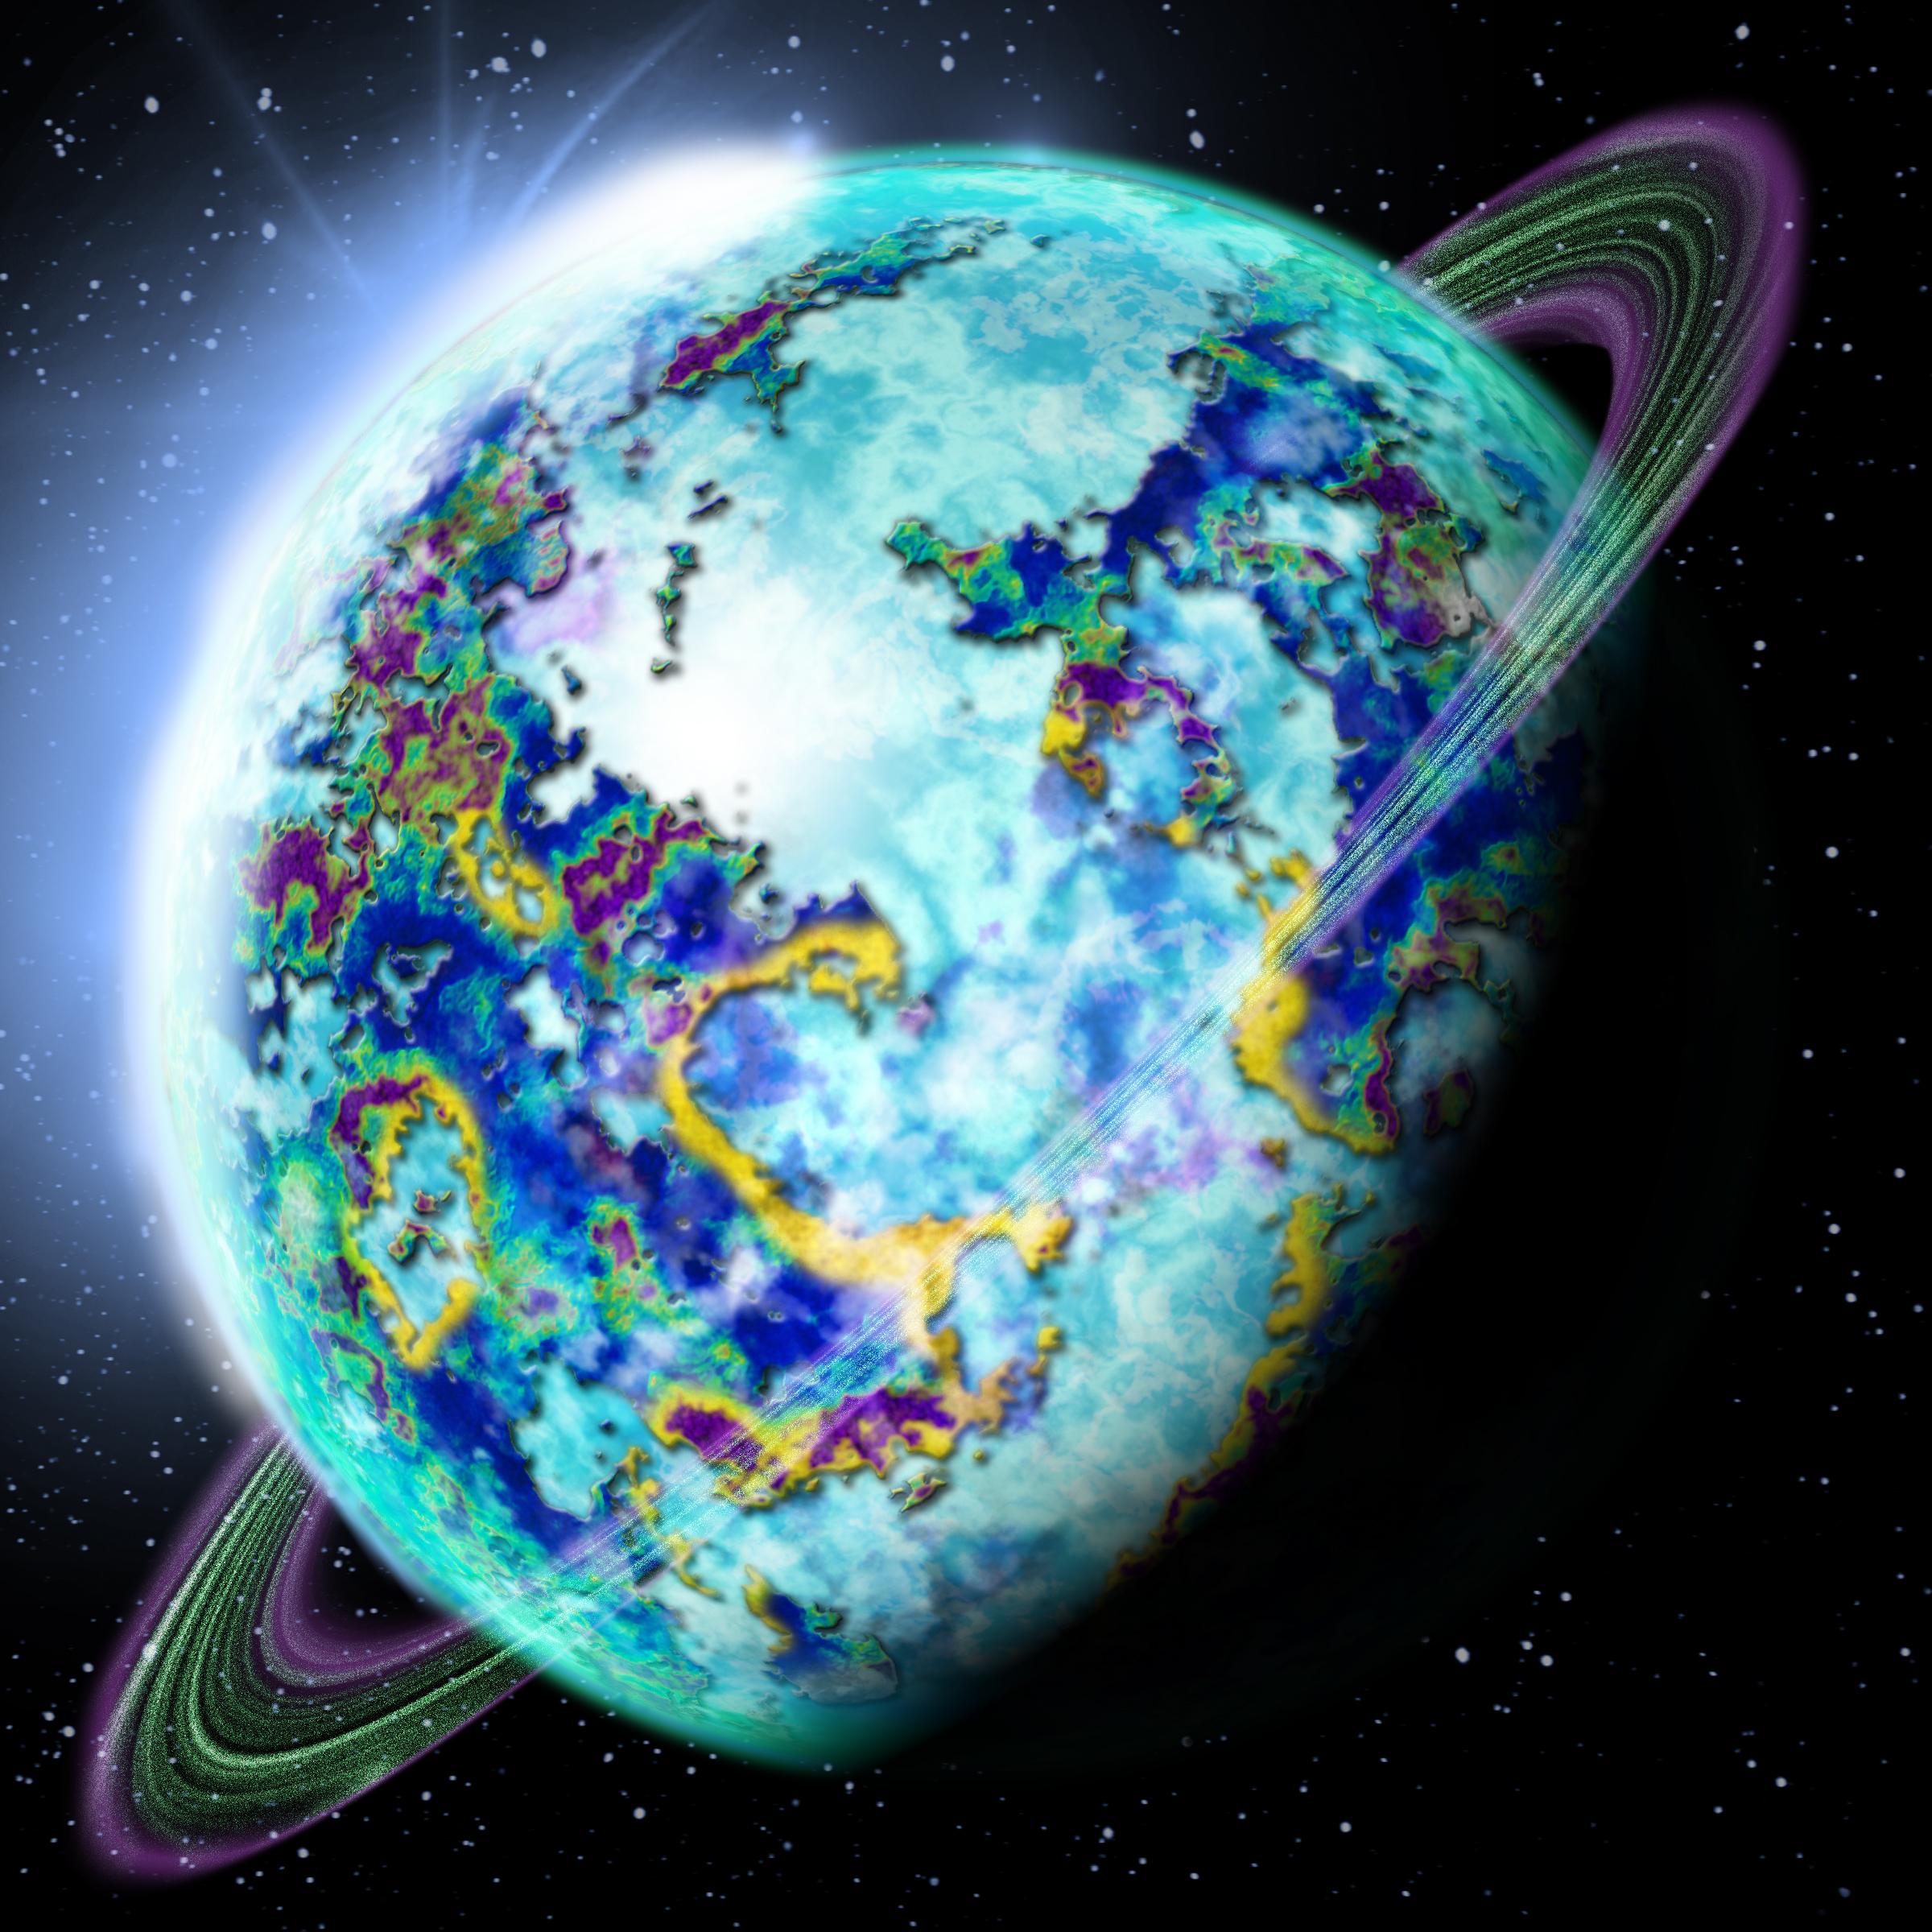 Planet Eltar by PatrickFury